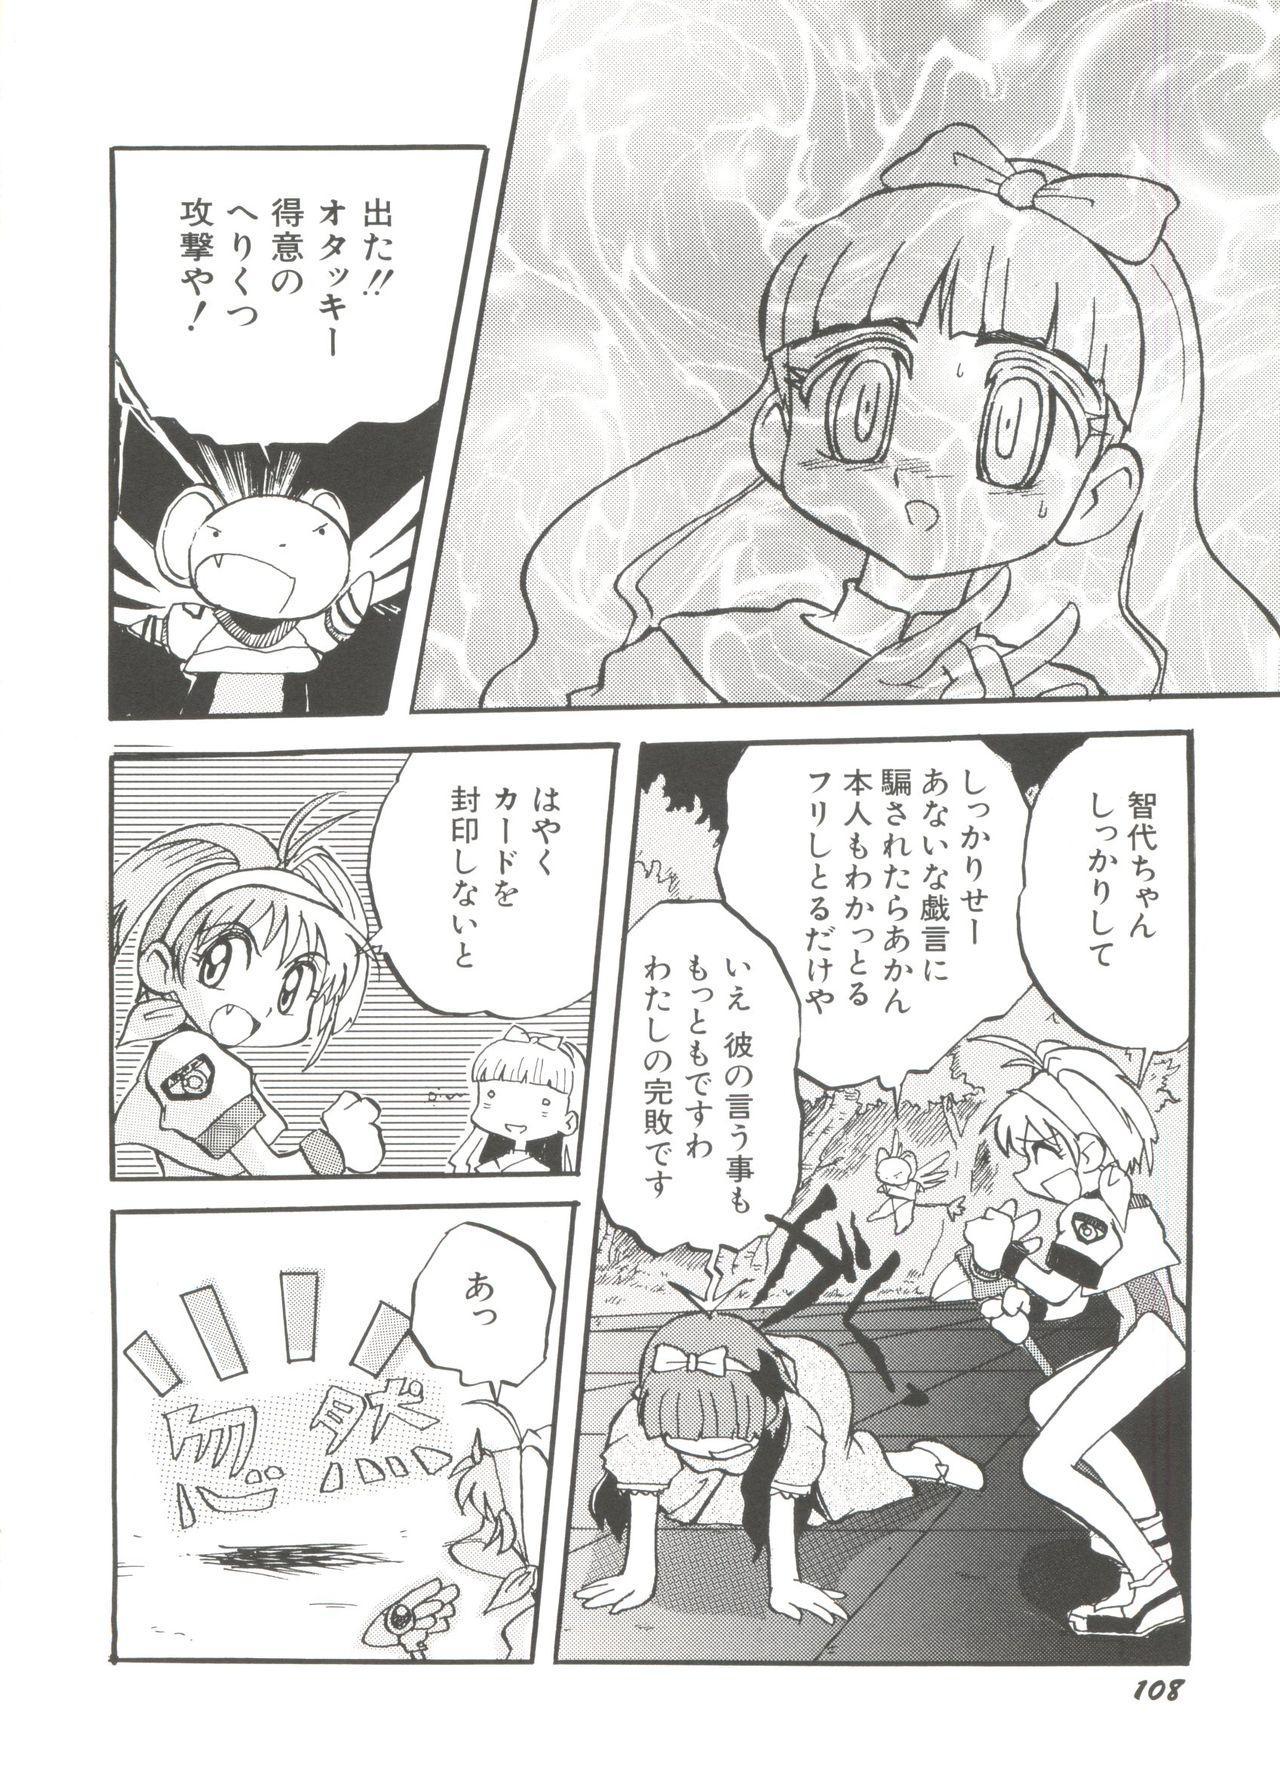 [Anthology] Denei Tamatebako 8 - Utakata no Tenshi-tachi II (Various) 109